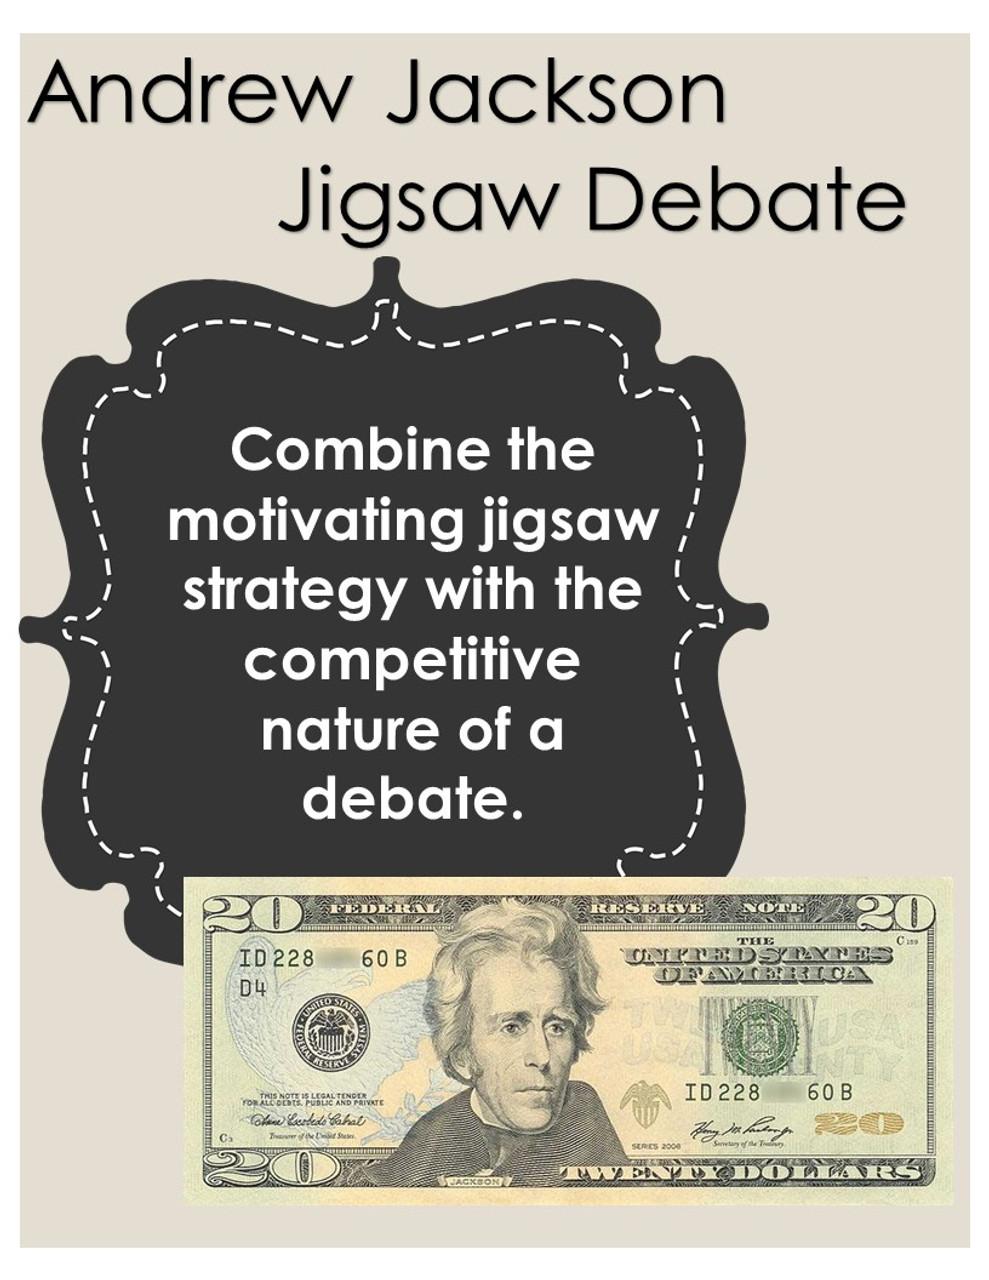 Andrew Jackson Jigsaw Debate - $20 Bill Argument